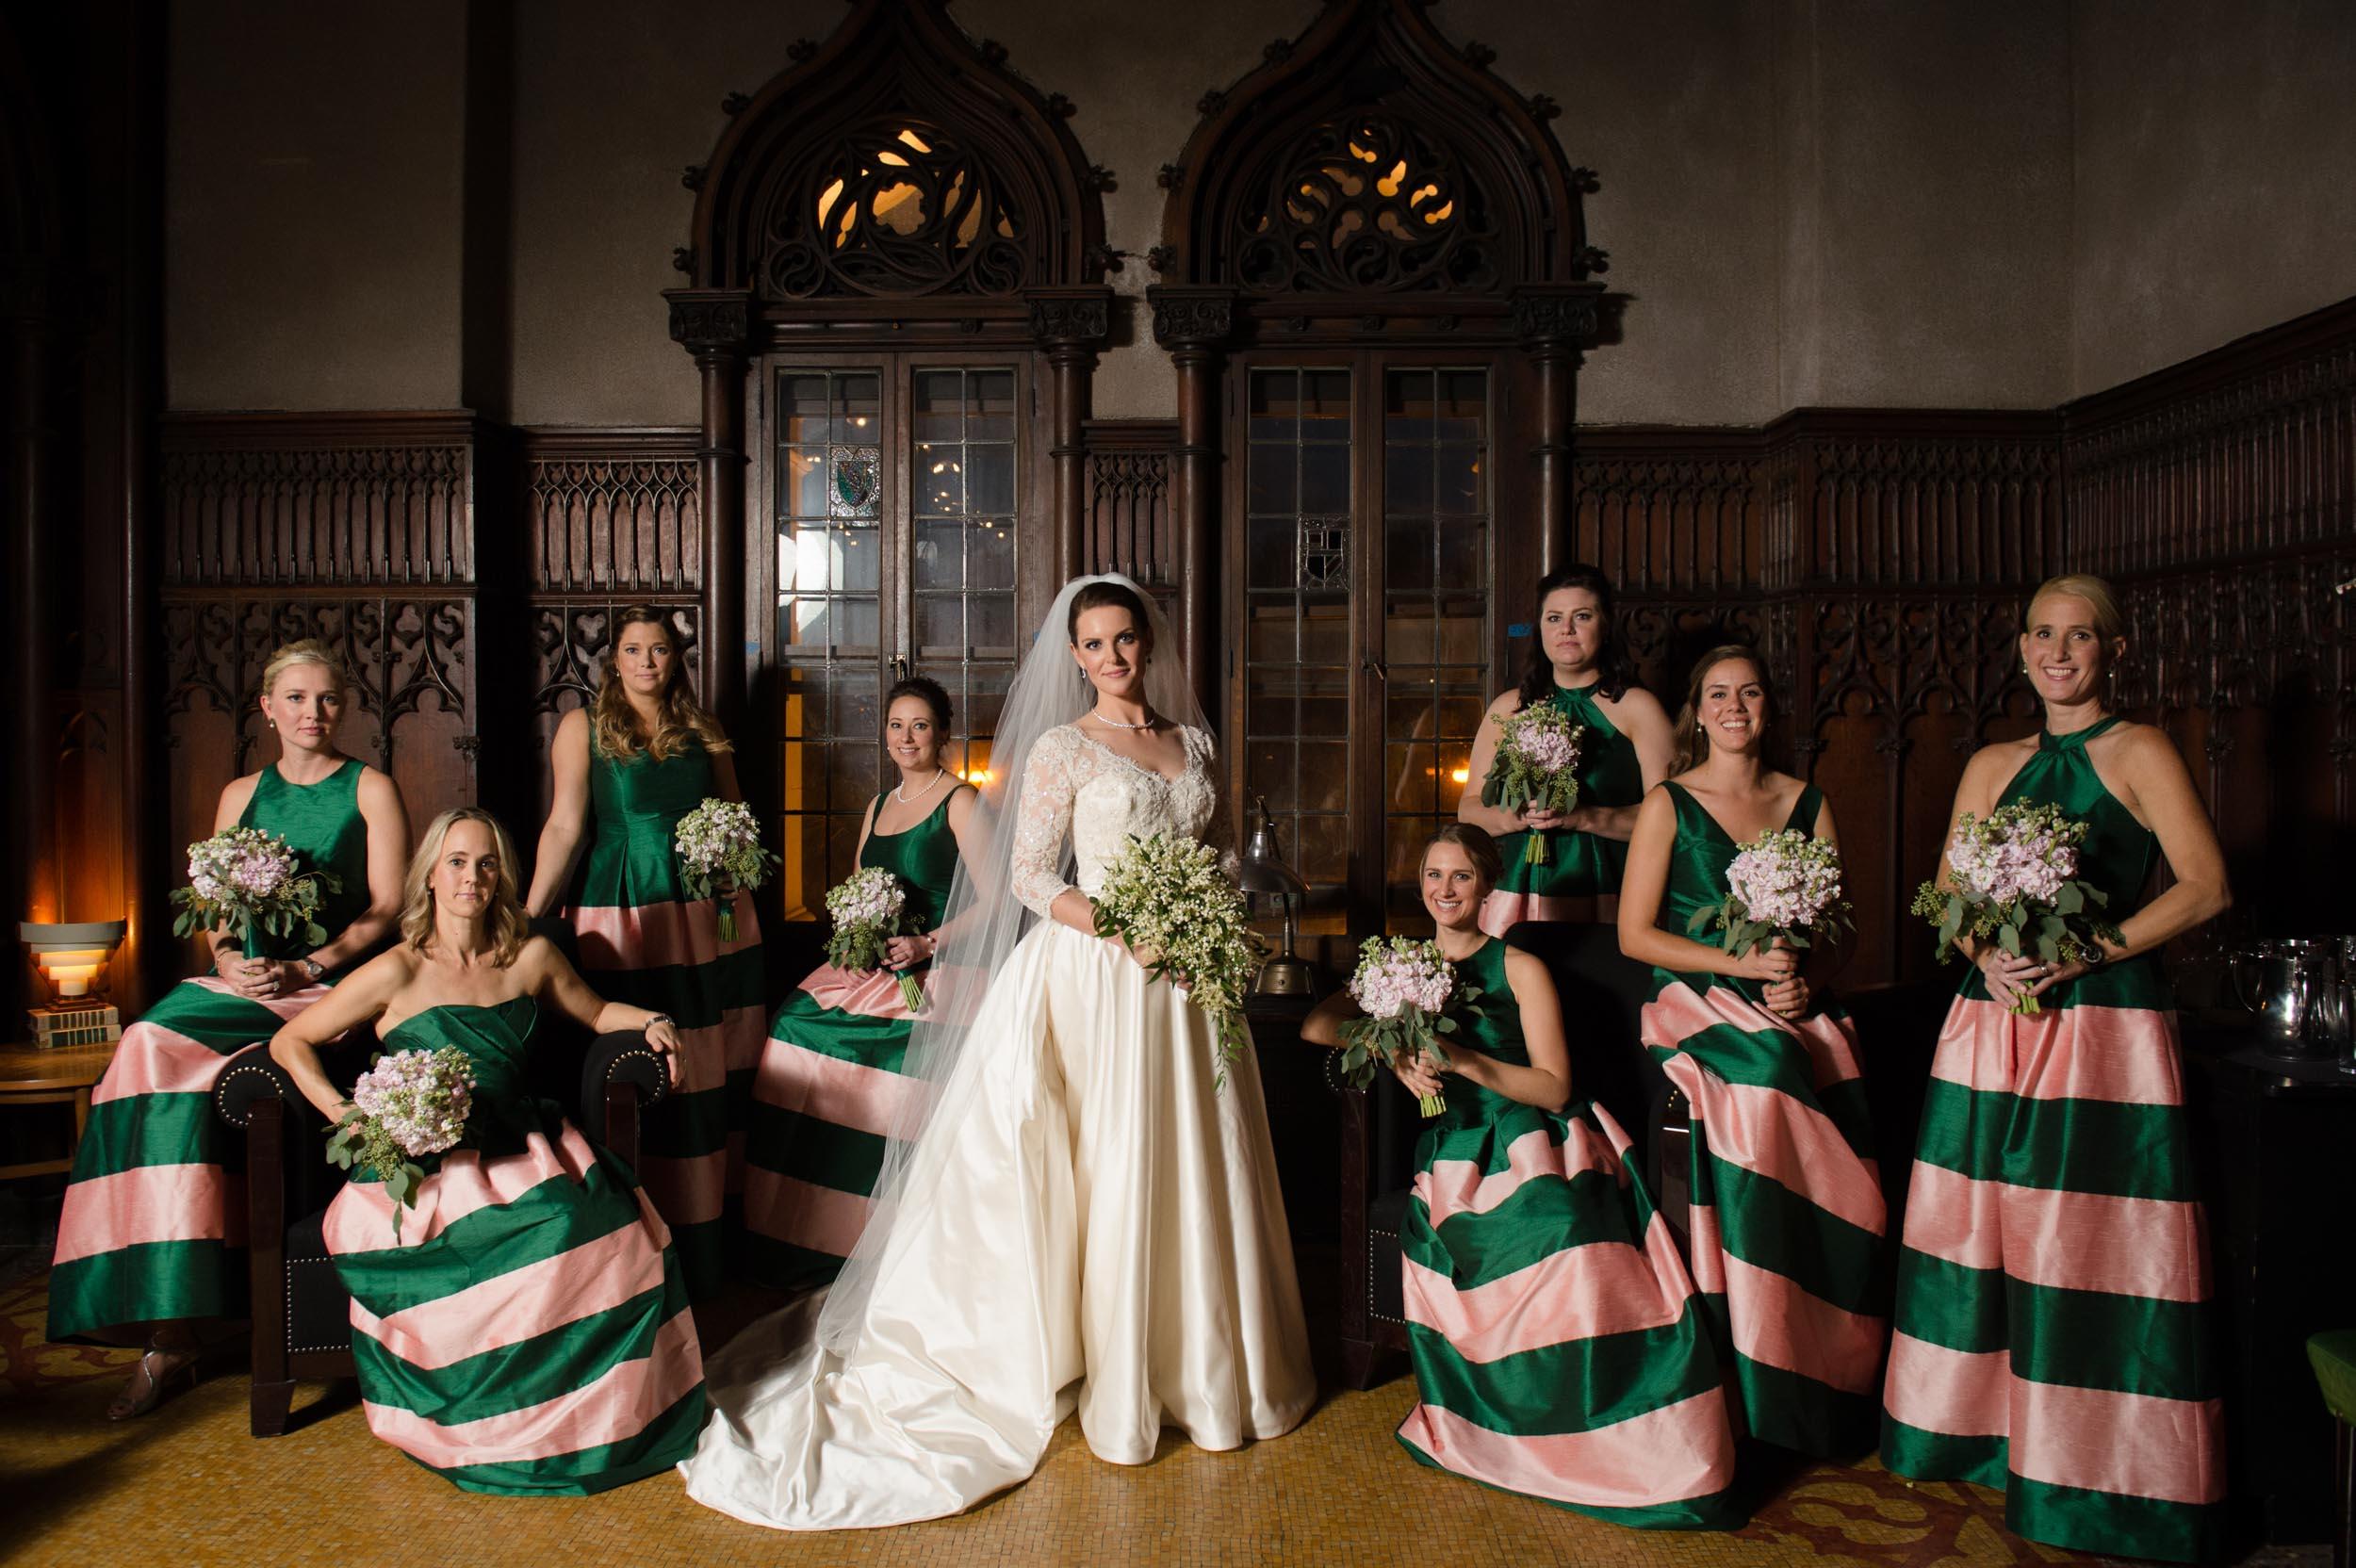 Editorial bridesmaids portrait at Chicago Athletic Association